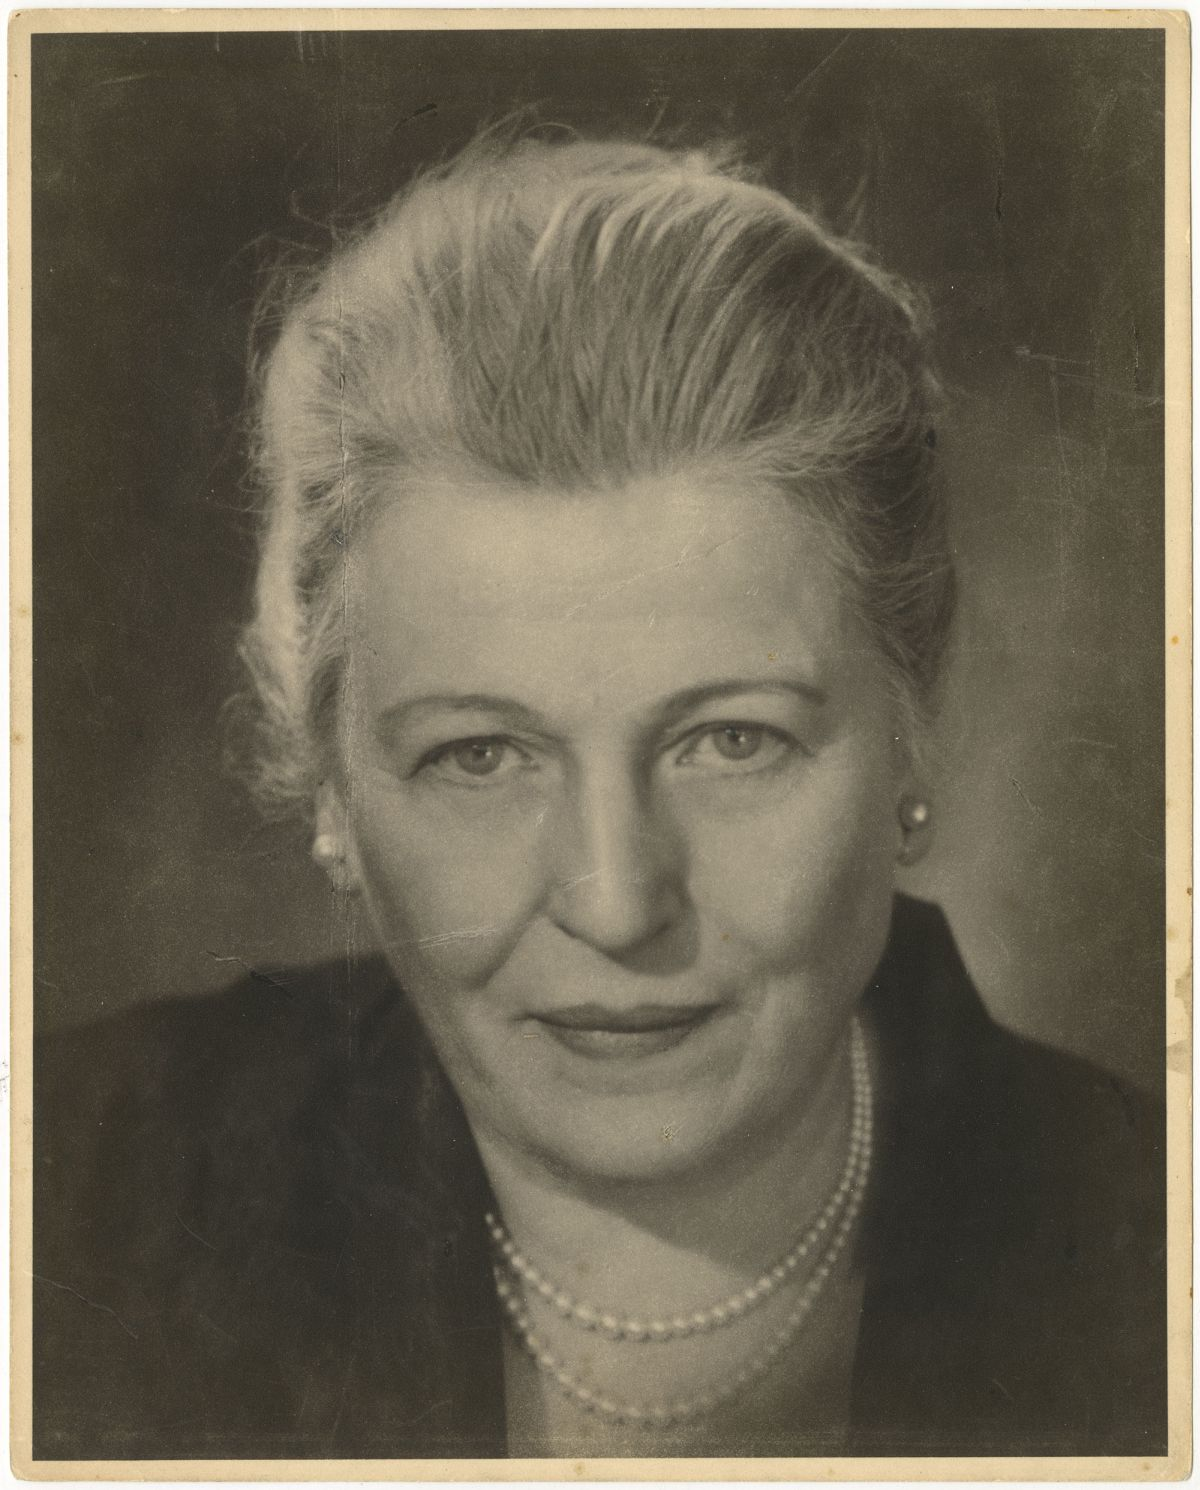 Photo: Editta Sherman (1912–2013); Pearl Buck; 1955. Gelatin silver print. New-York Historical Society; Gift of Kenneth Sherman.